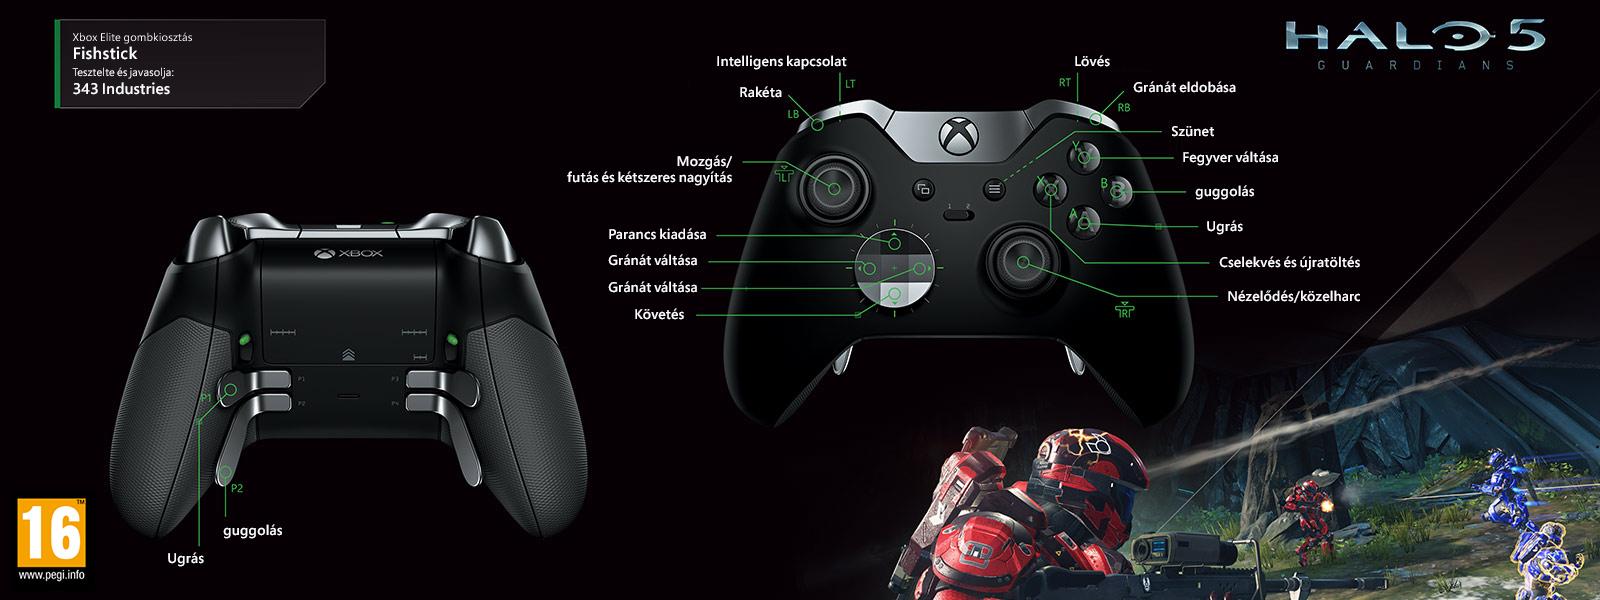 "Halo 5 – ""Fishstick"" Elite-gombkiosztás"